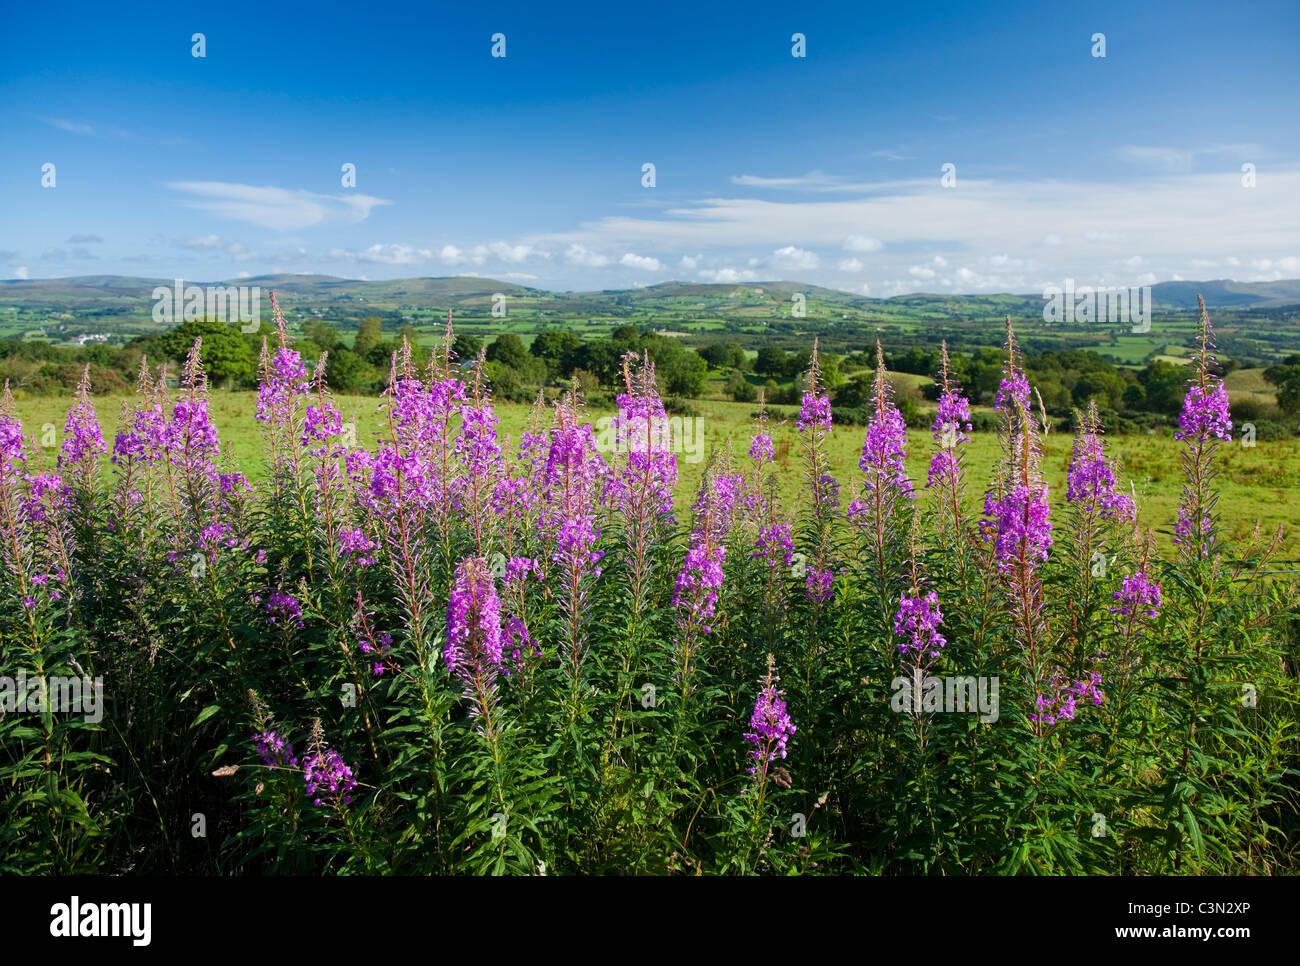 Rosebay Willowherb (Chamerion angustifolium) beneath the Sperrin Mountains, County Tyrone, Northern Ireland. - Stock Image